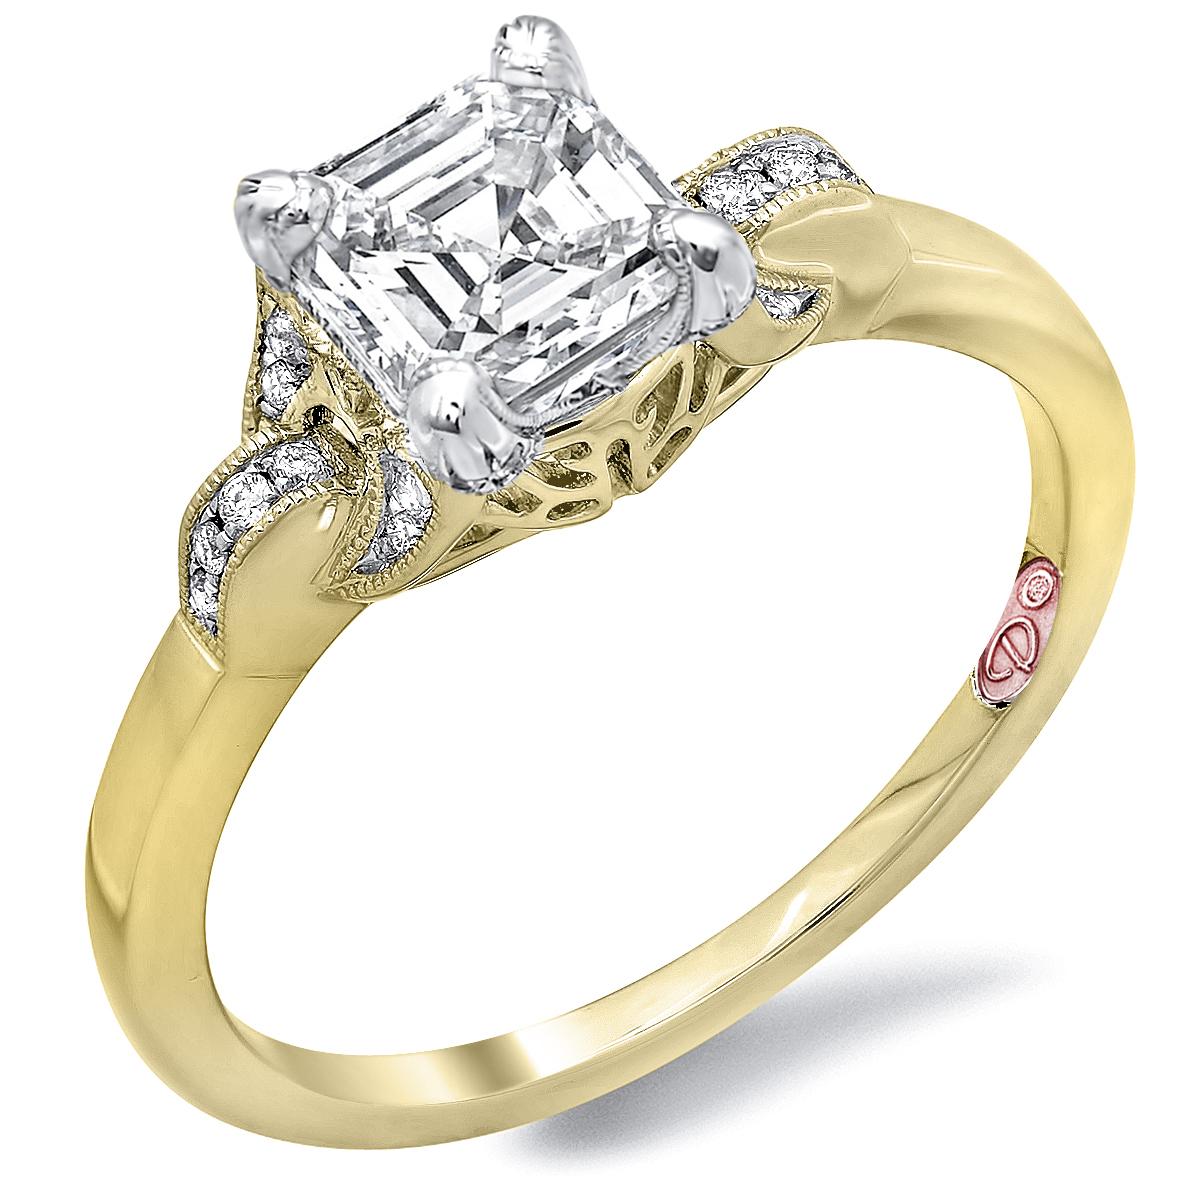 Designer Wedding Rings Gold Engagement Rings Yellow Gold Engagement Rings Designer